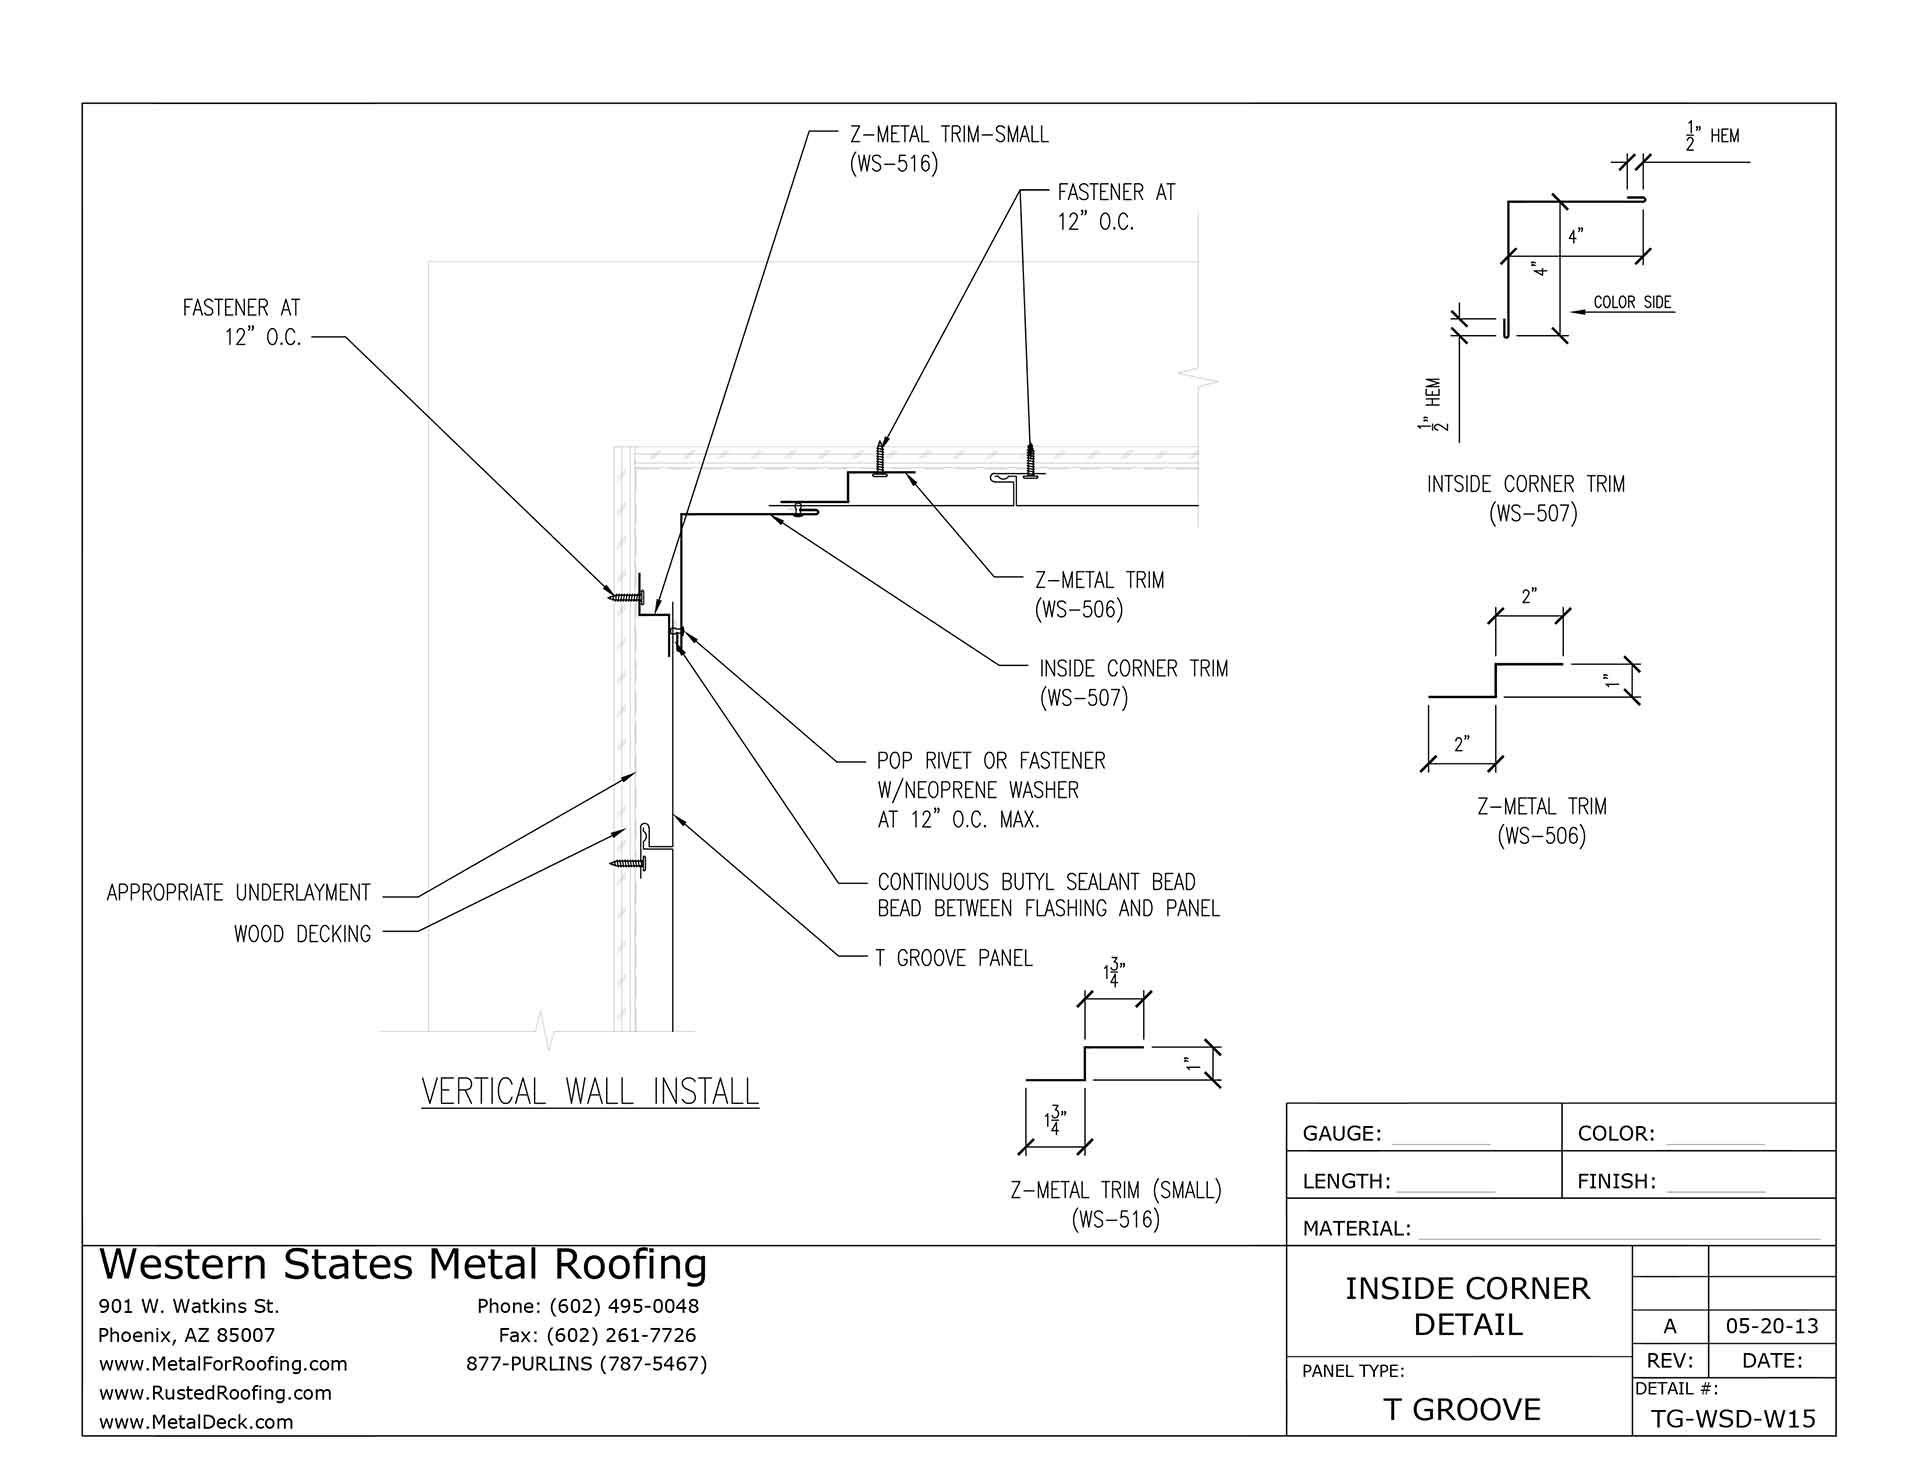 https://f.hubspotusercontent30.net/hubfs/6069238/images/trim-flashings/t-groove/tg-wsd-w15-inside-corner-detail.jpg